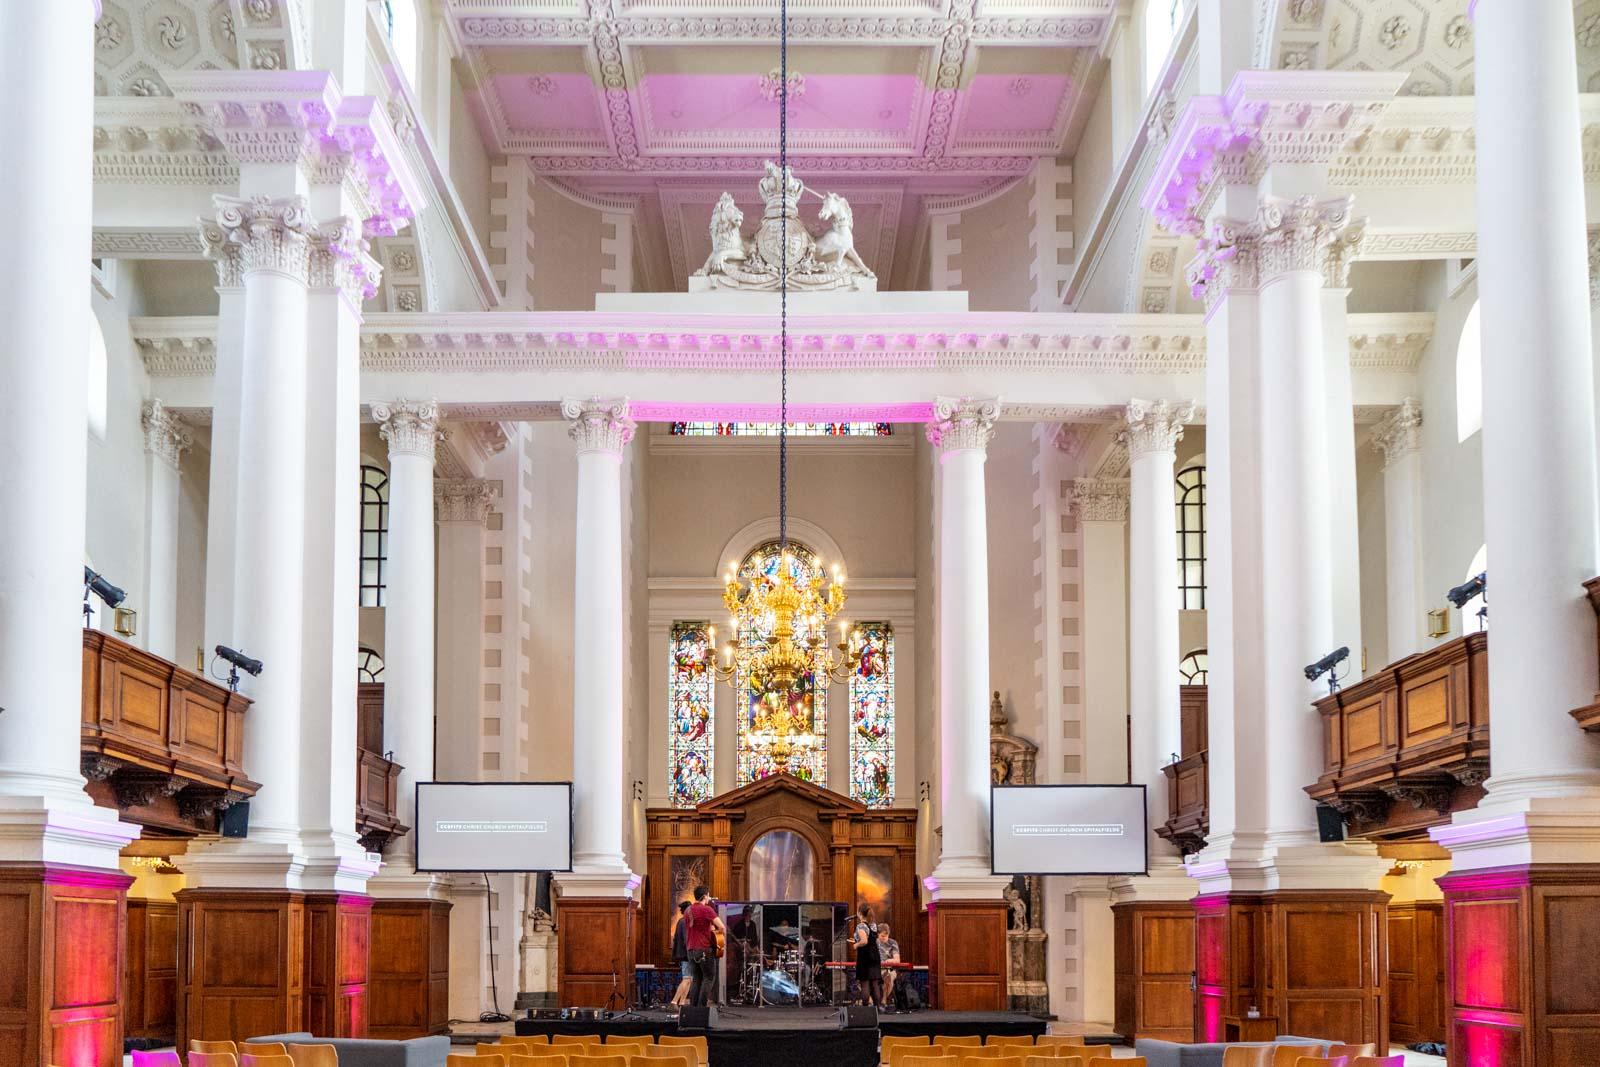 Christ Church, Spitalfields